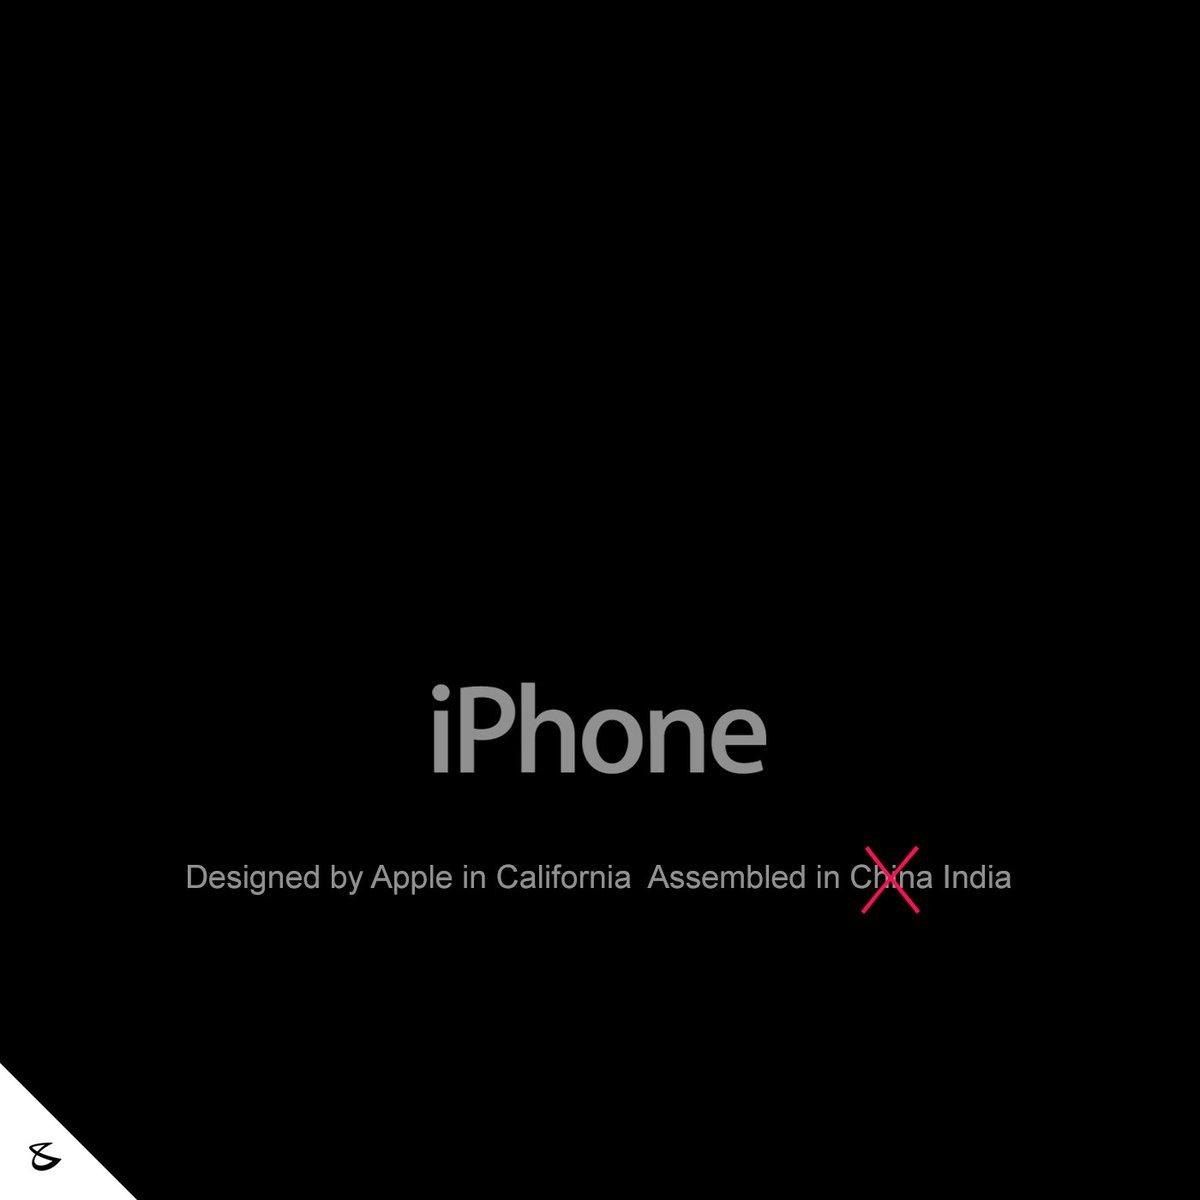 Apple gears up to manufacture iPhones in India. #CantWait #AppleIndia #OneStepCloser #Apple #iPhone7s #MakeInIndia @RajivMakhni https://t.co/haoECiP4CI